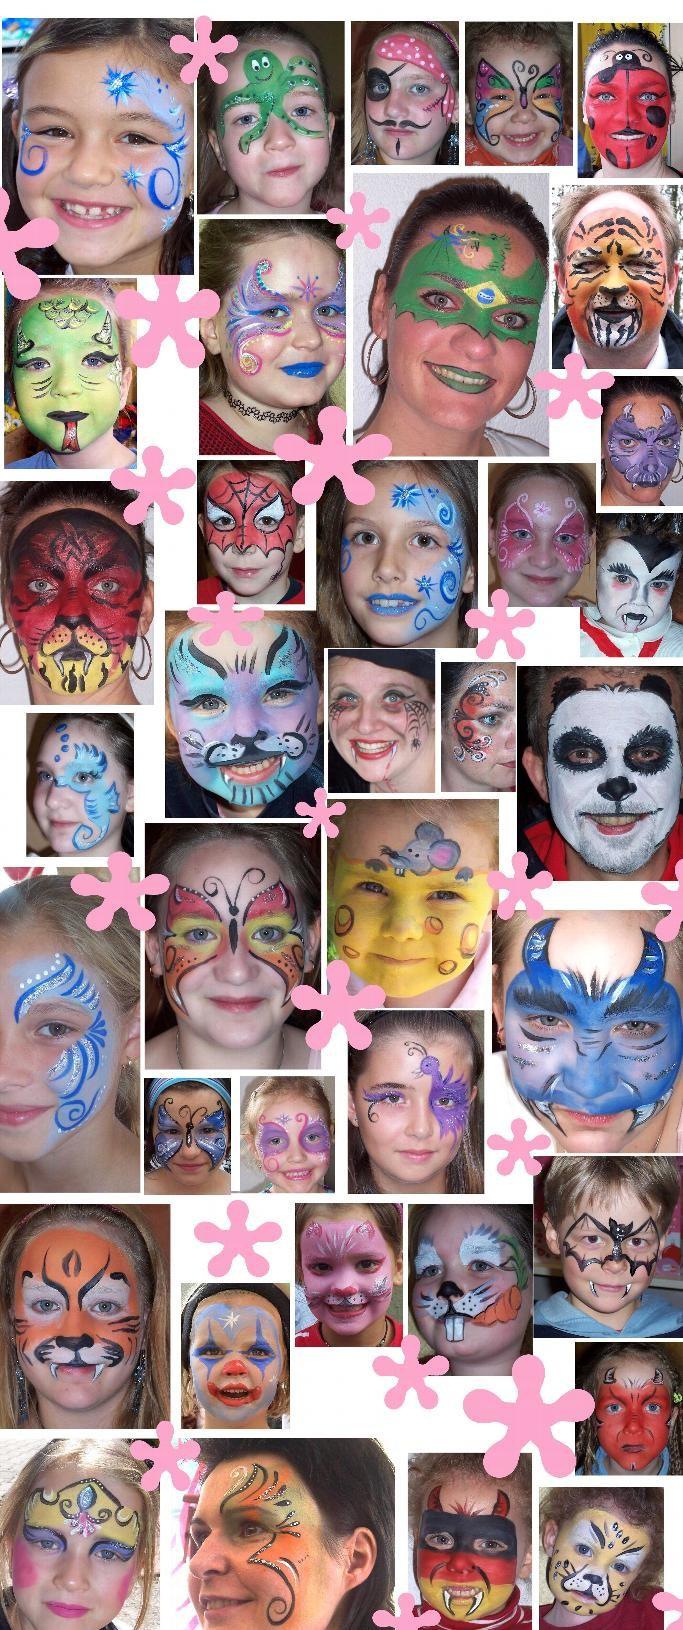 Kinderschminken, Glitzer Tattos, Kinderbetreuung, Ballone, Ballontiere, Basteltisch, Leingarten, Neckarsulm, Heilbronn, Pforzheim, Karlsruhe,  Rastatt, Bretten, Bruchsal